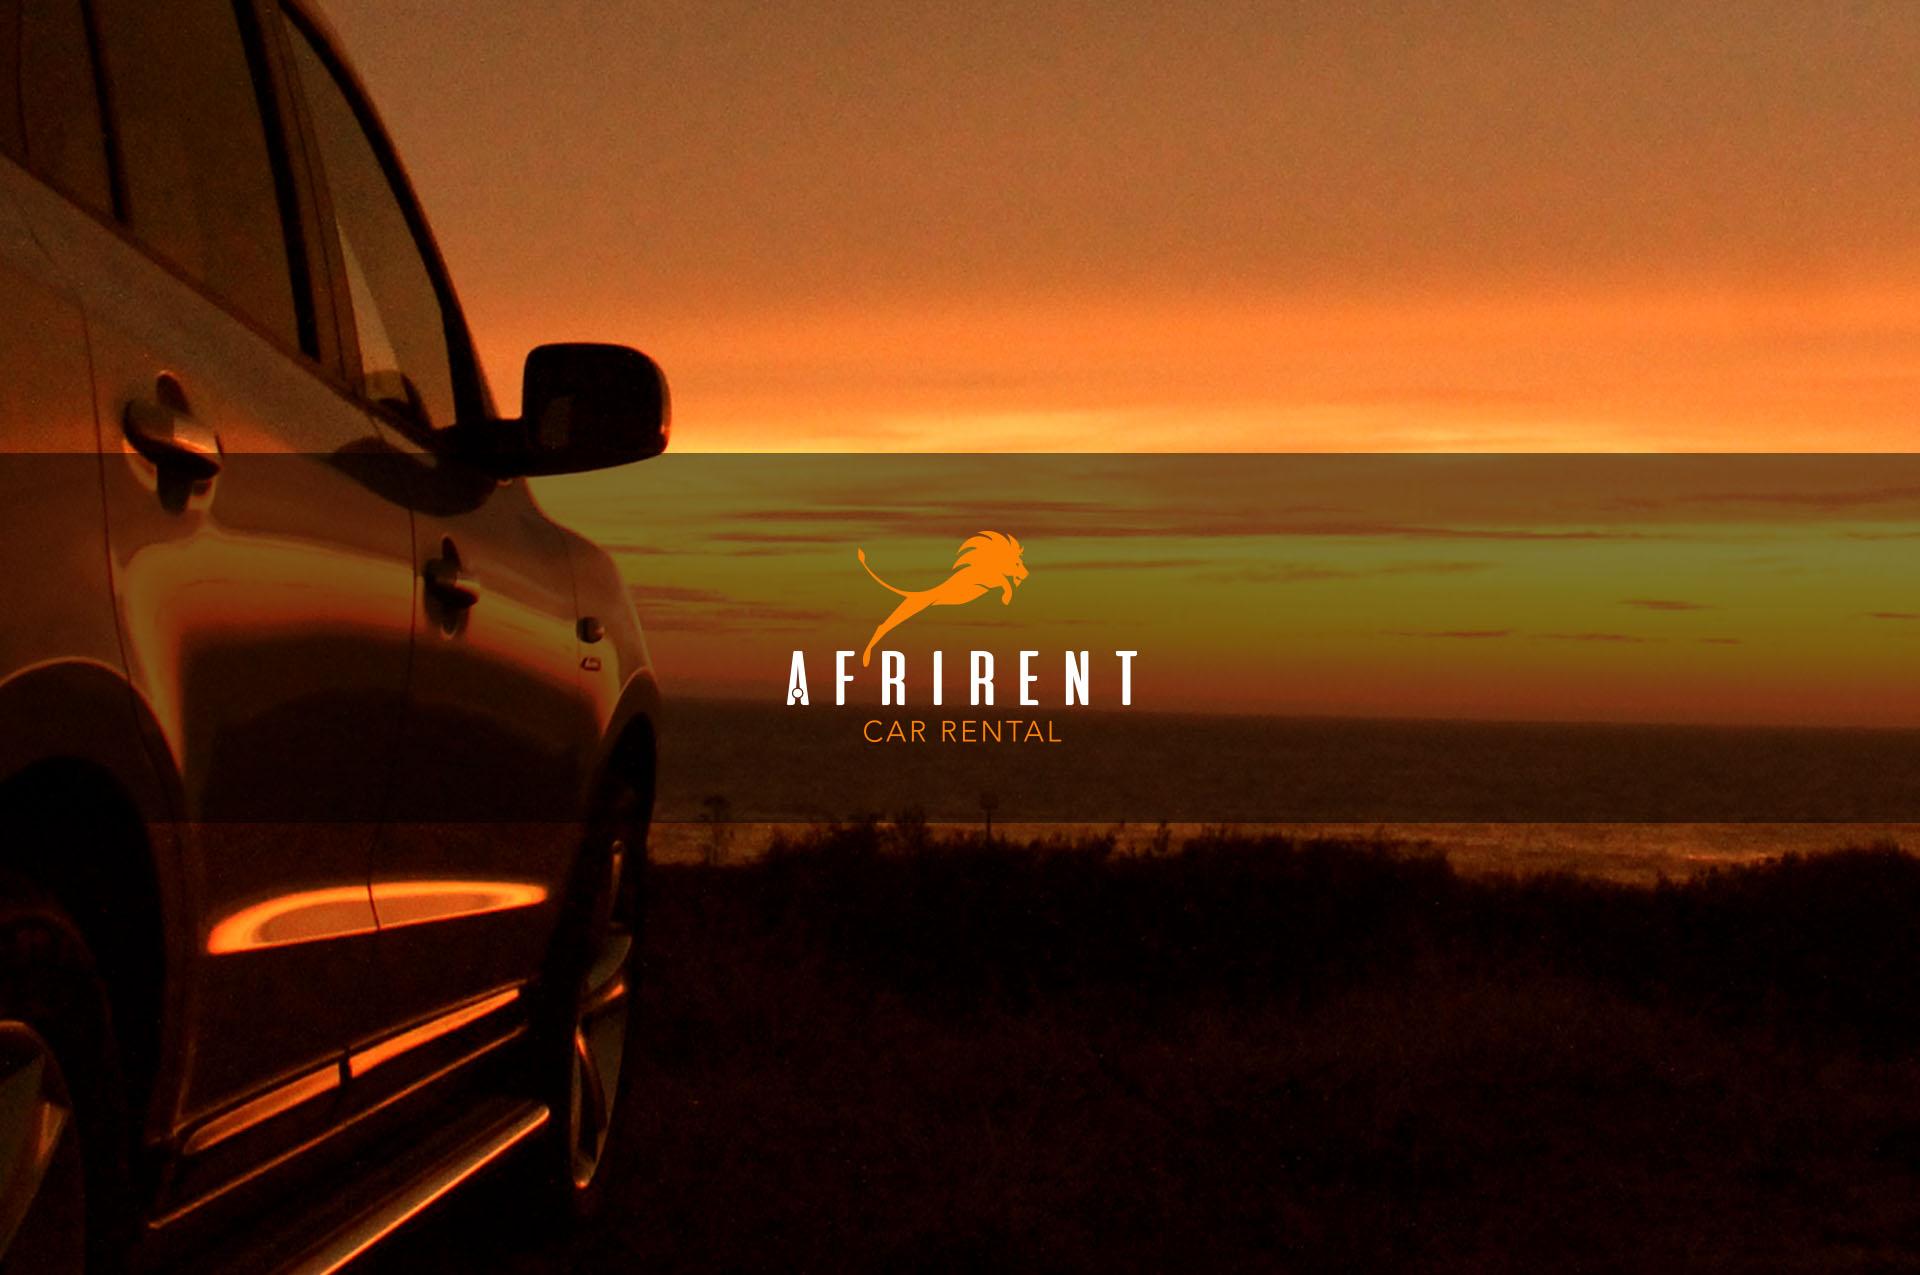 AFRIRENT CAR RENTAL